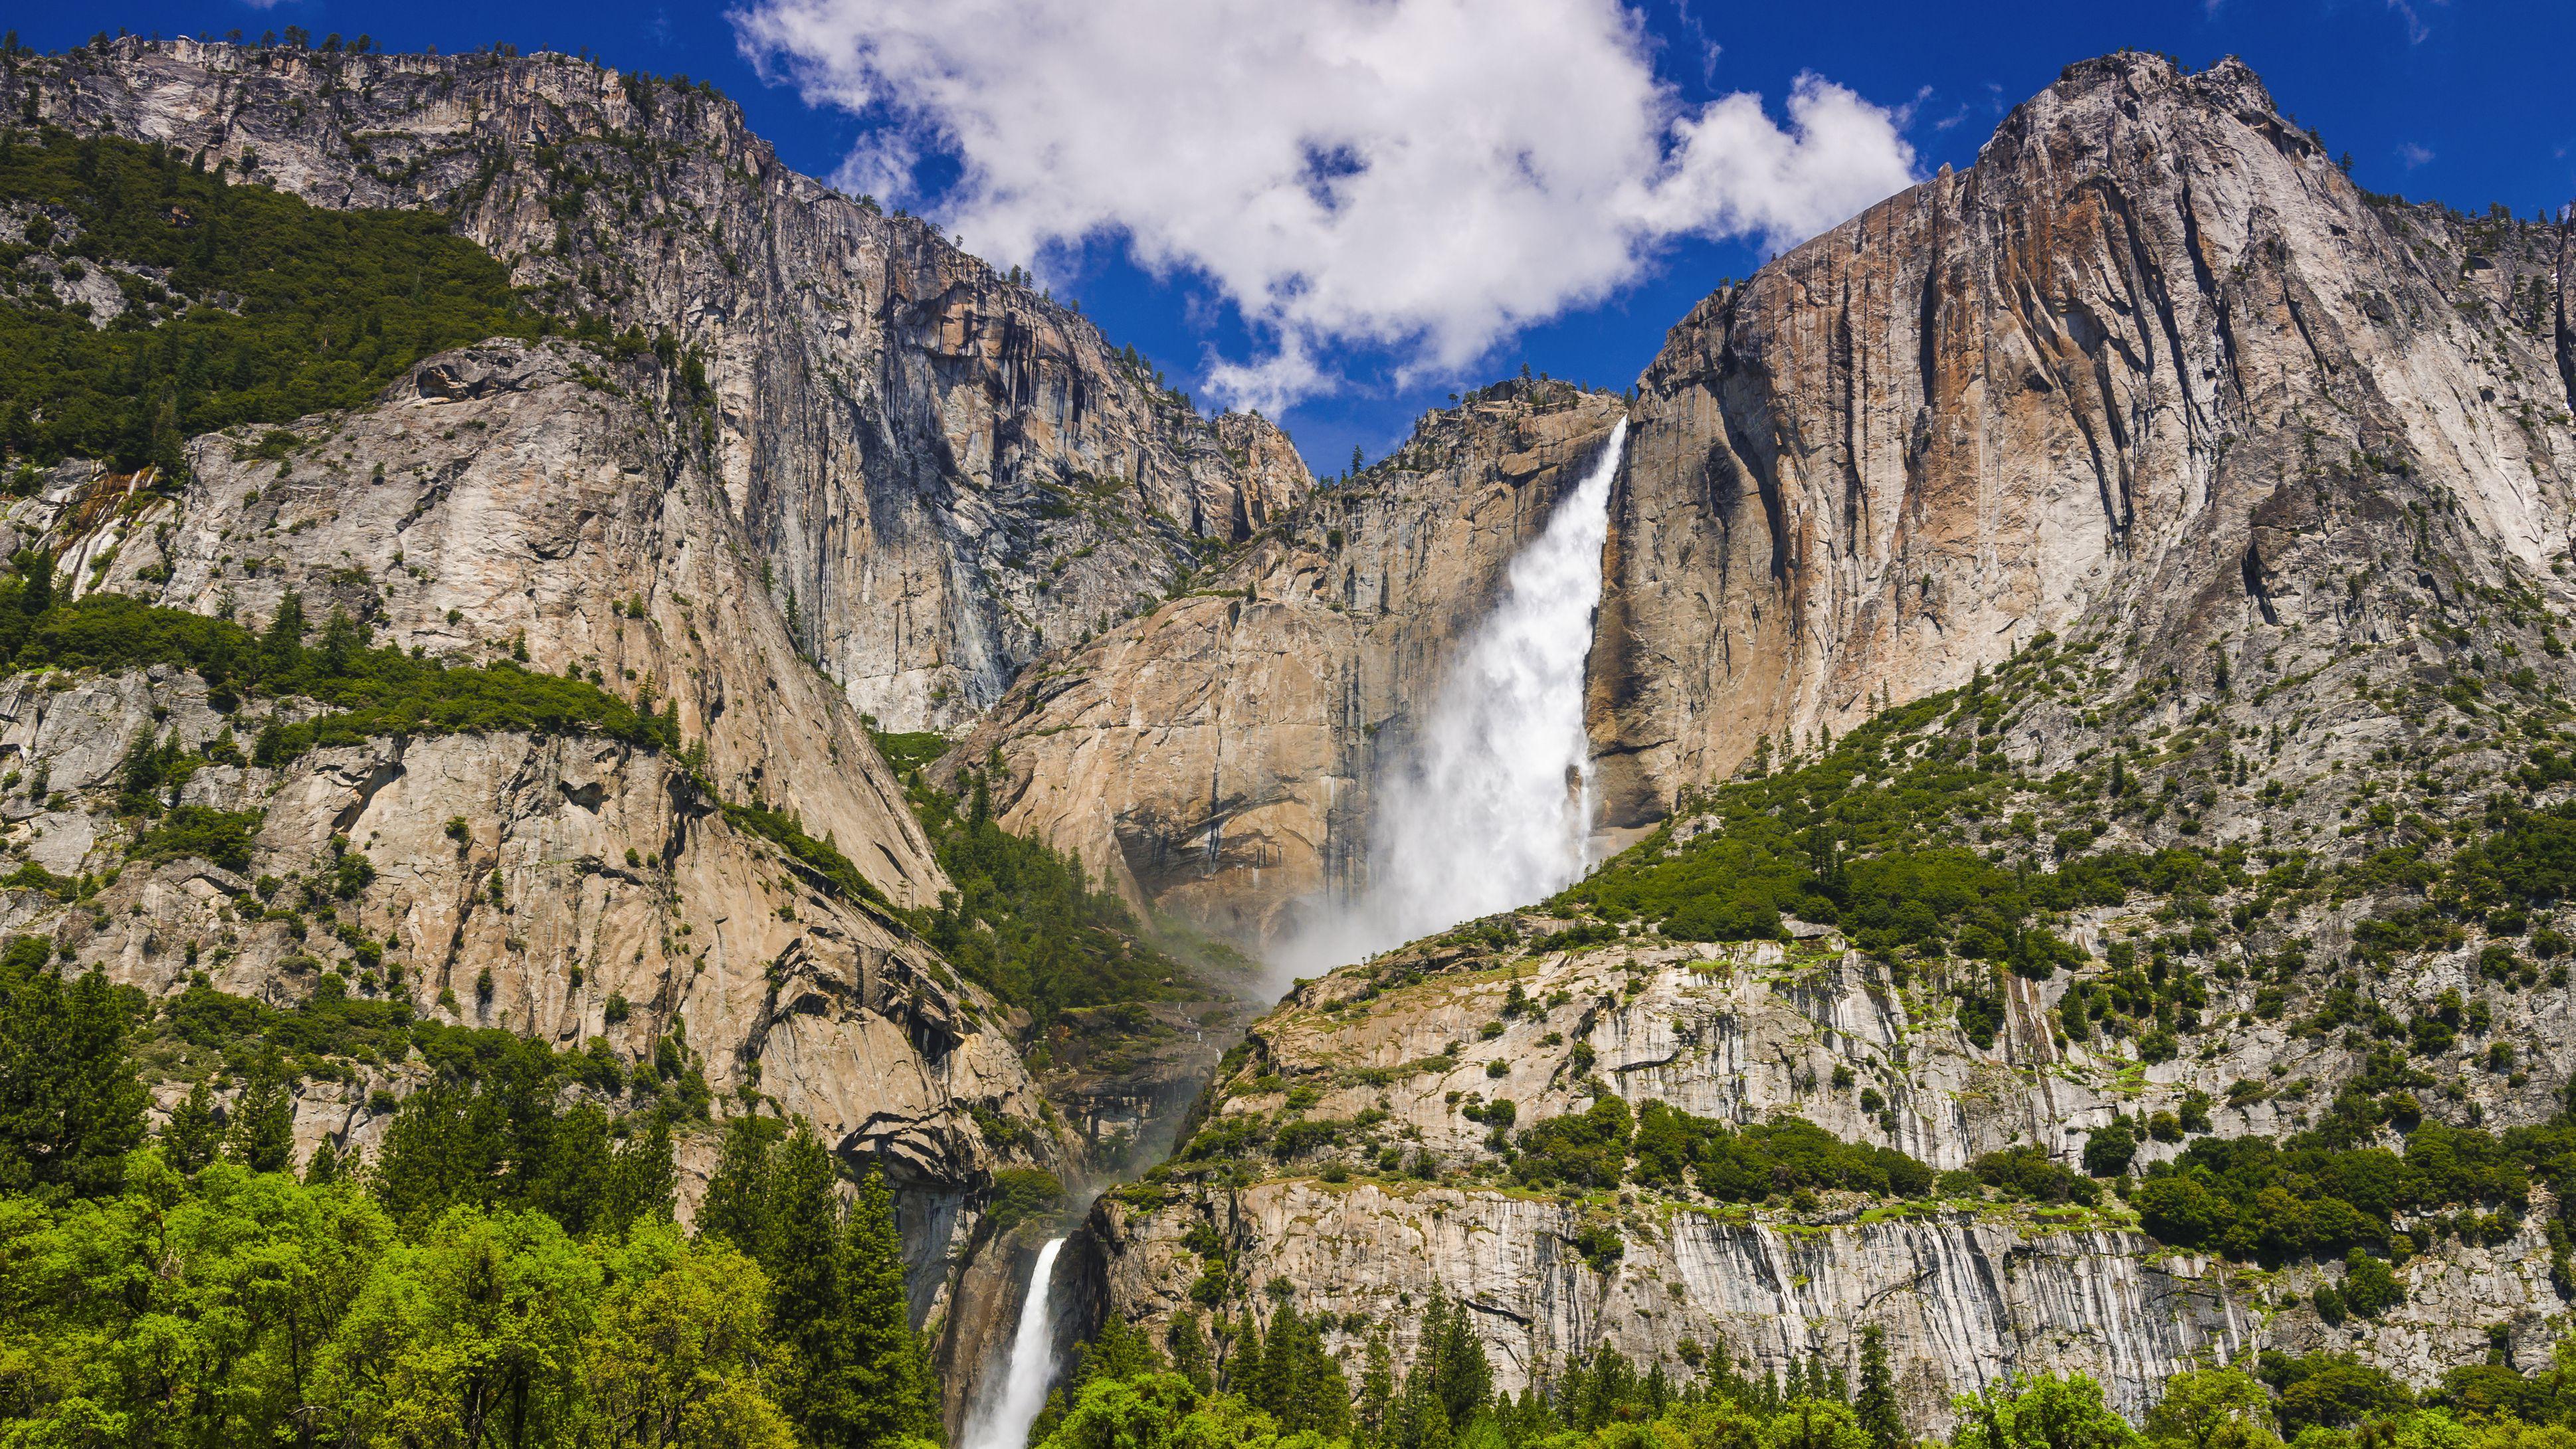 Waterfalls, Top 10 Most Beautiful Waterfalls in the World (Updated 2021), Phenomenal Place